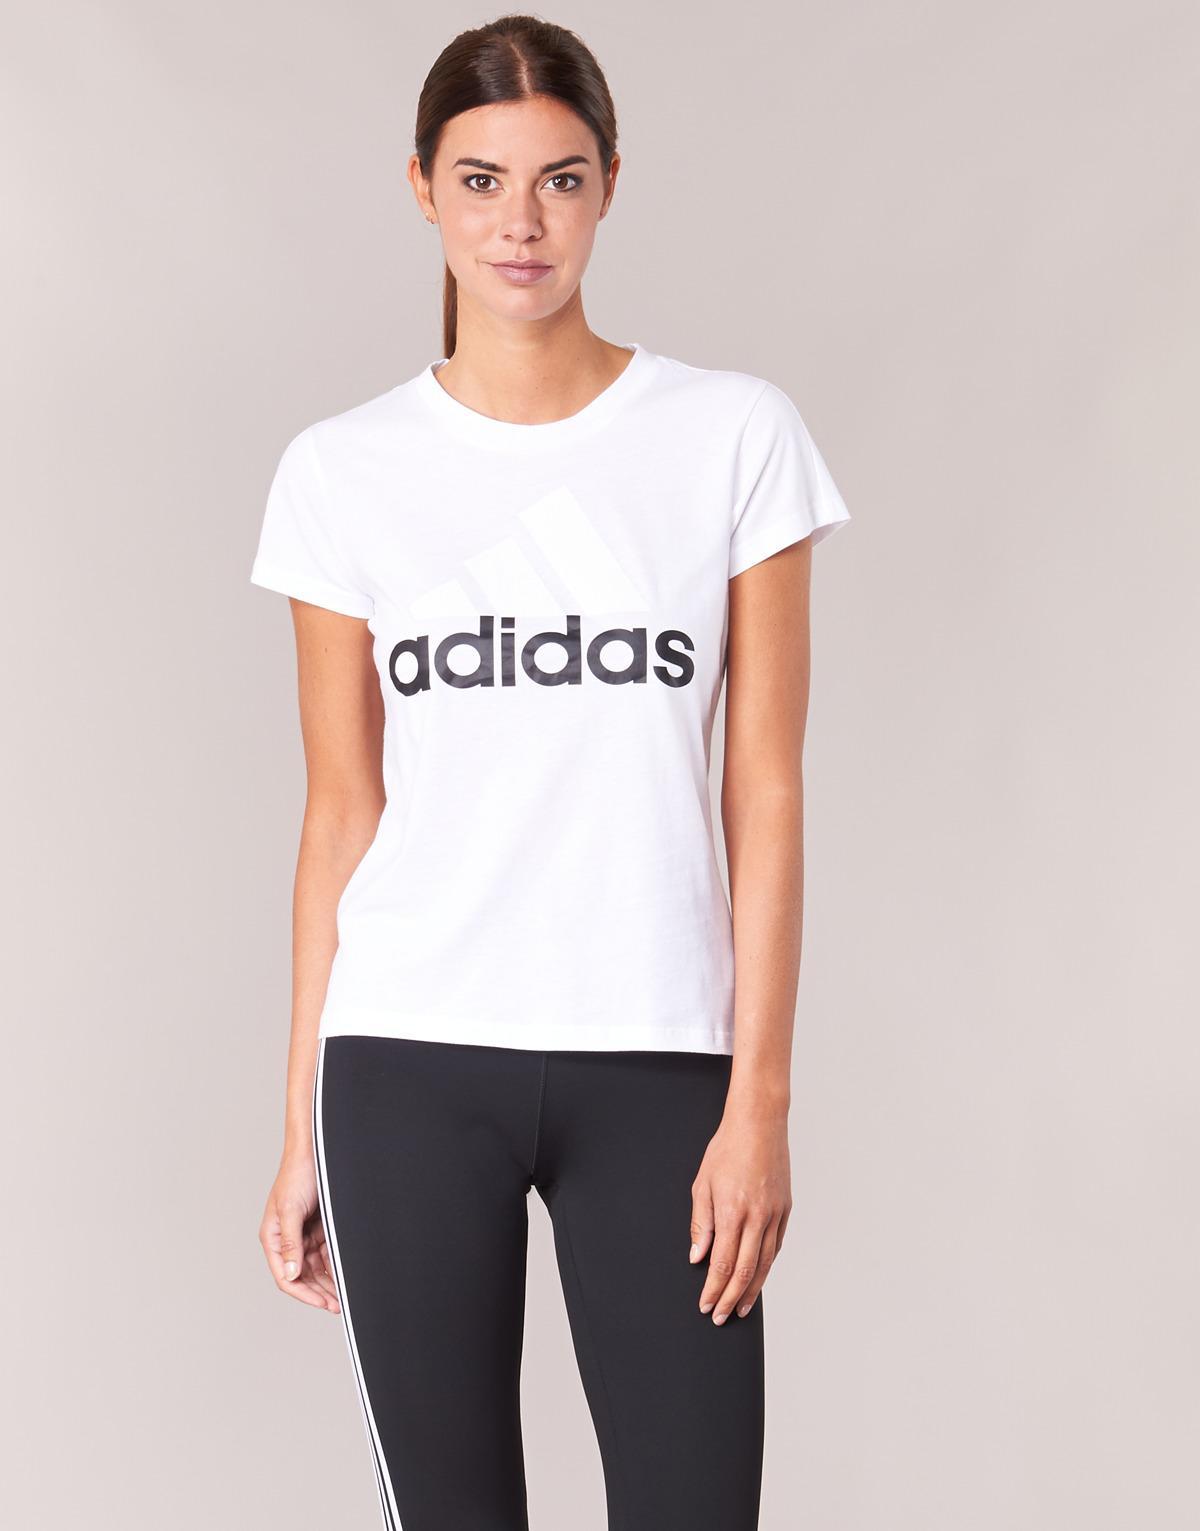 Adidas - Ess Li Sli Tee Women's T Shirt In White - Lyst. View Fullscreen